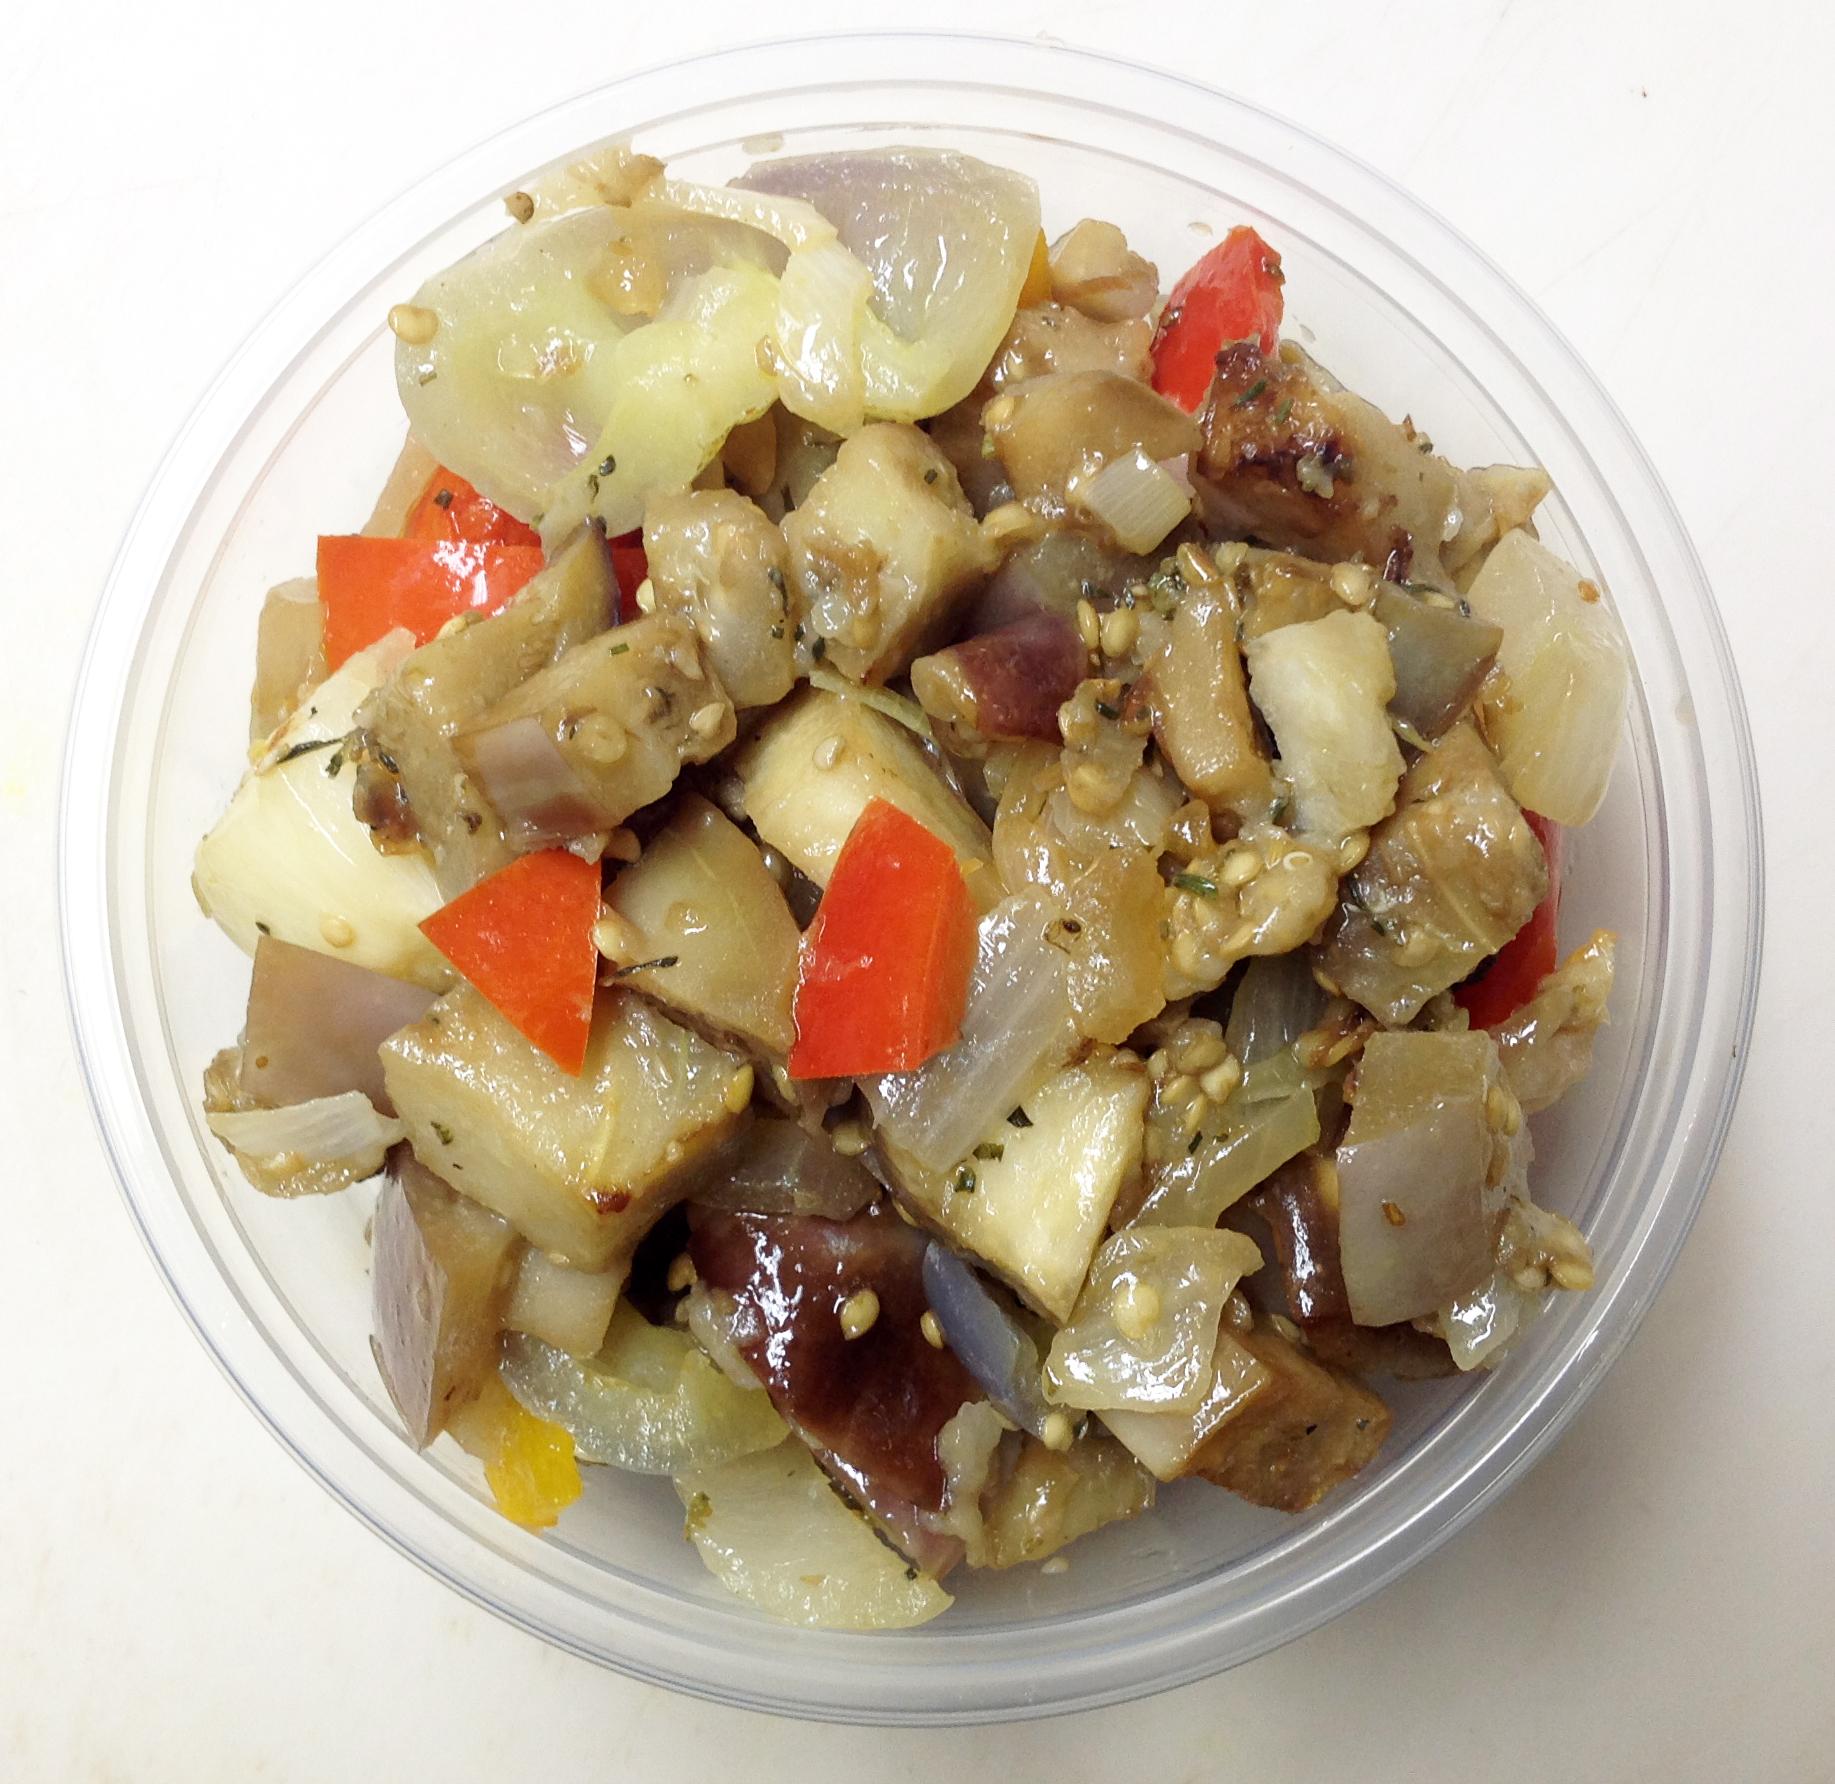 Eggplant, bell, saute, thyme, salt